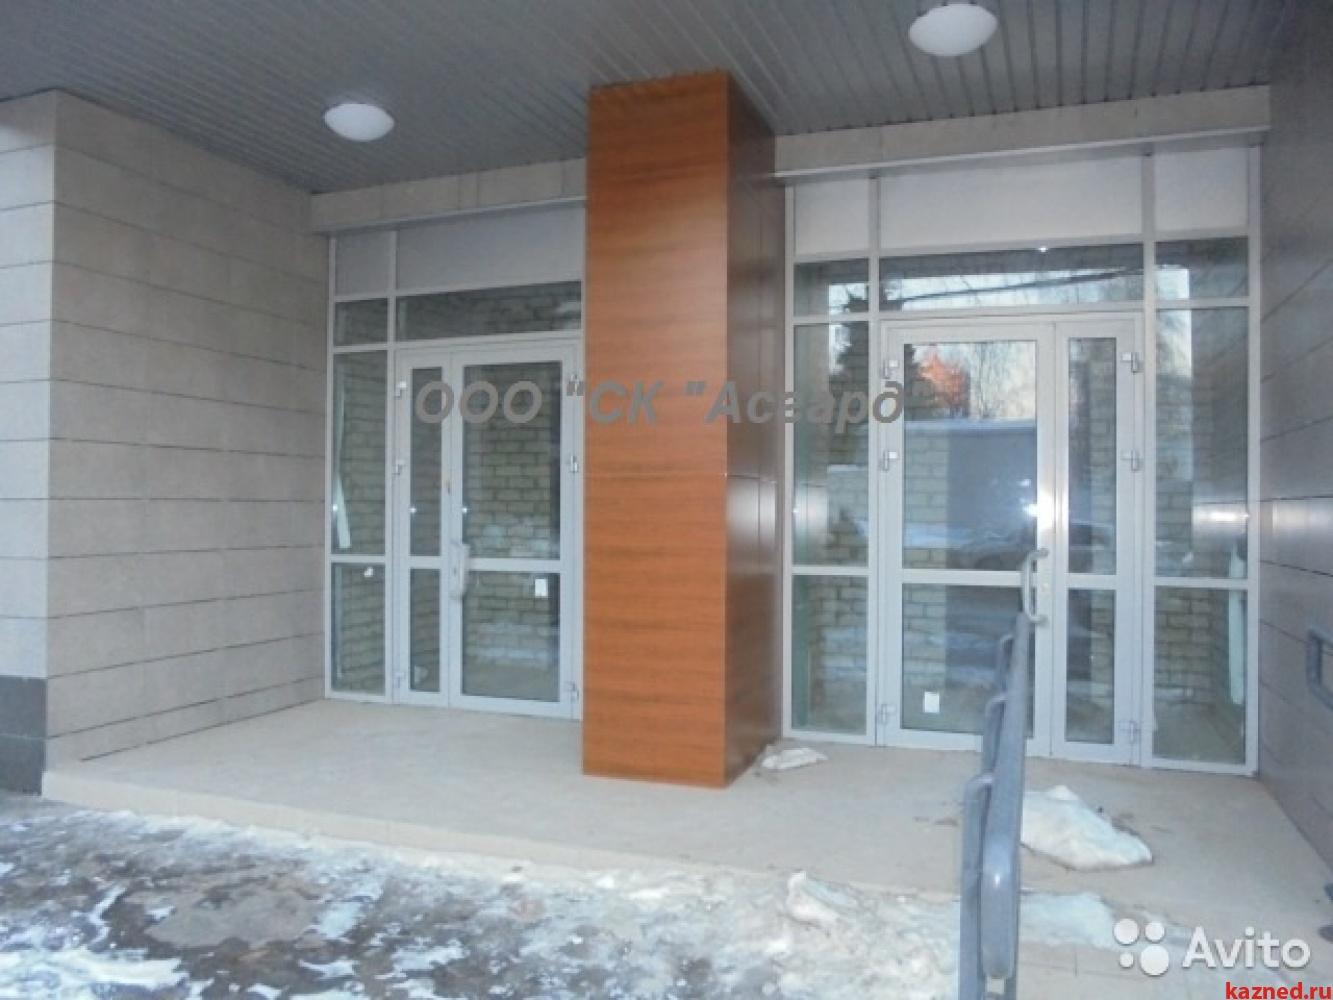 Продажа  Офисно-торговые Шуртыгина д.8, 209 м2  (миниатюра №1)